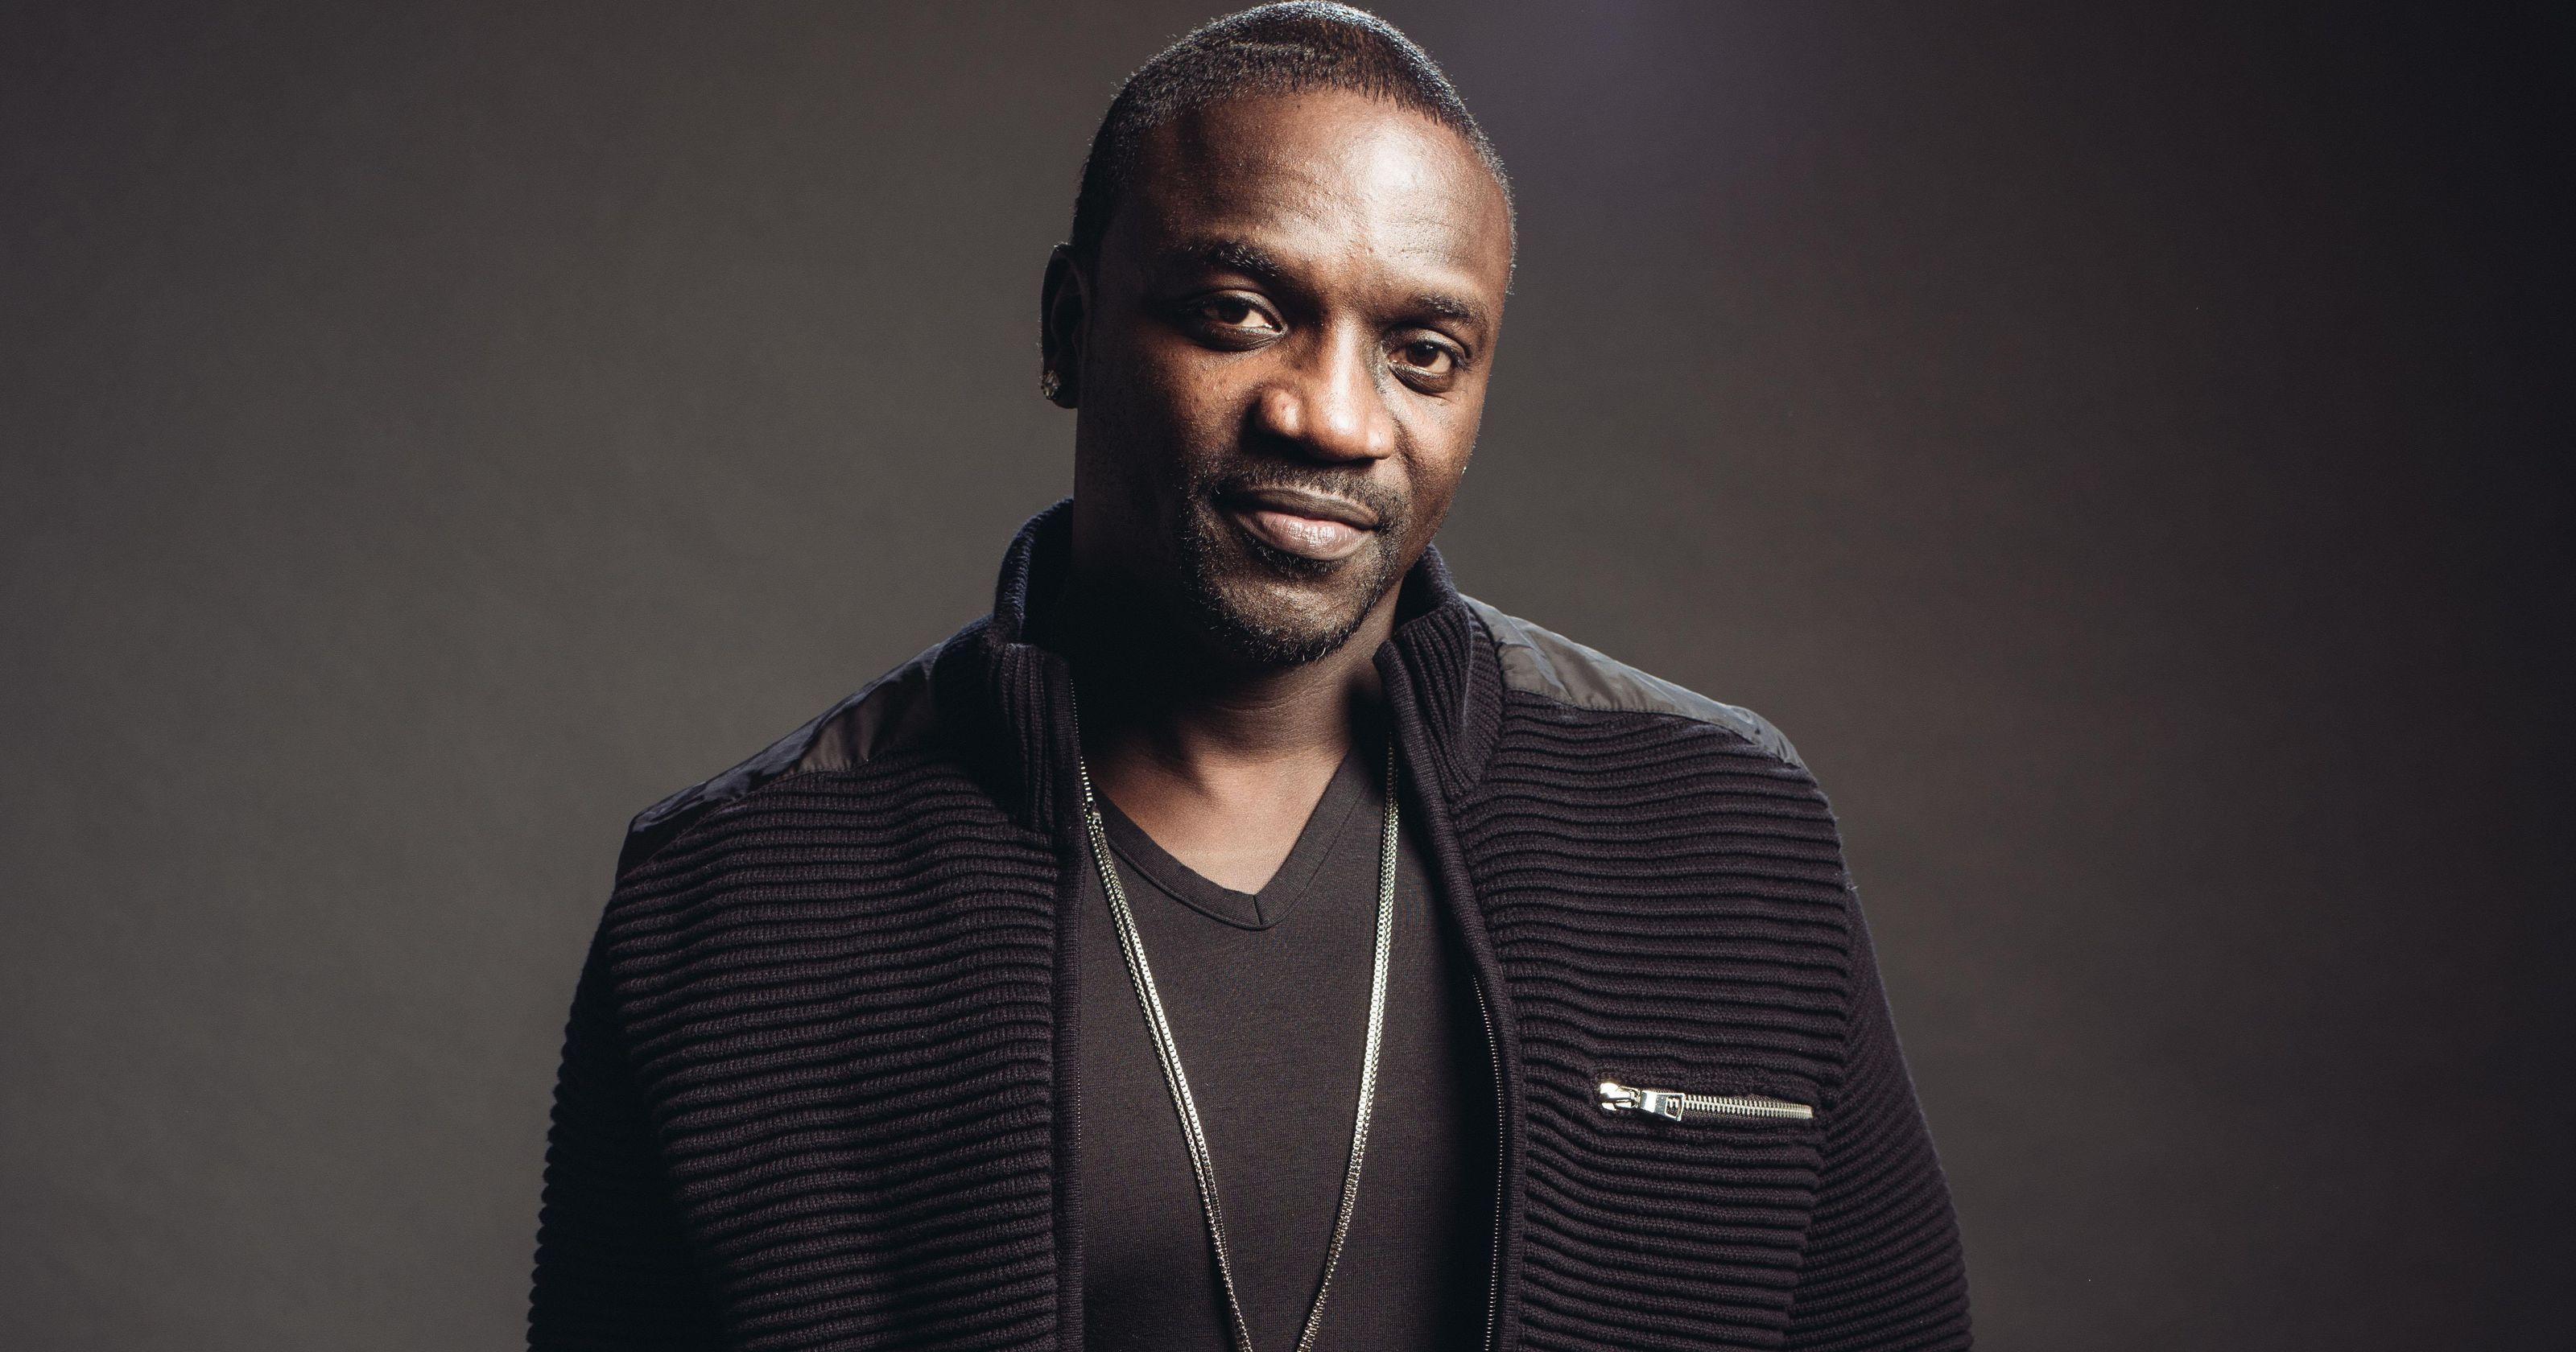 Akon Background